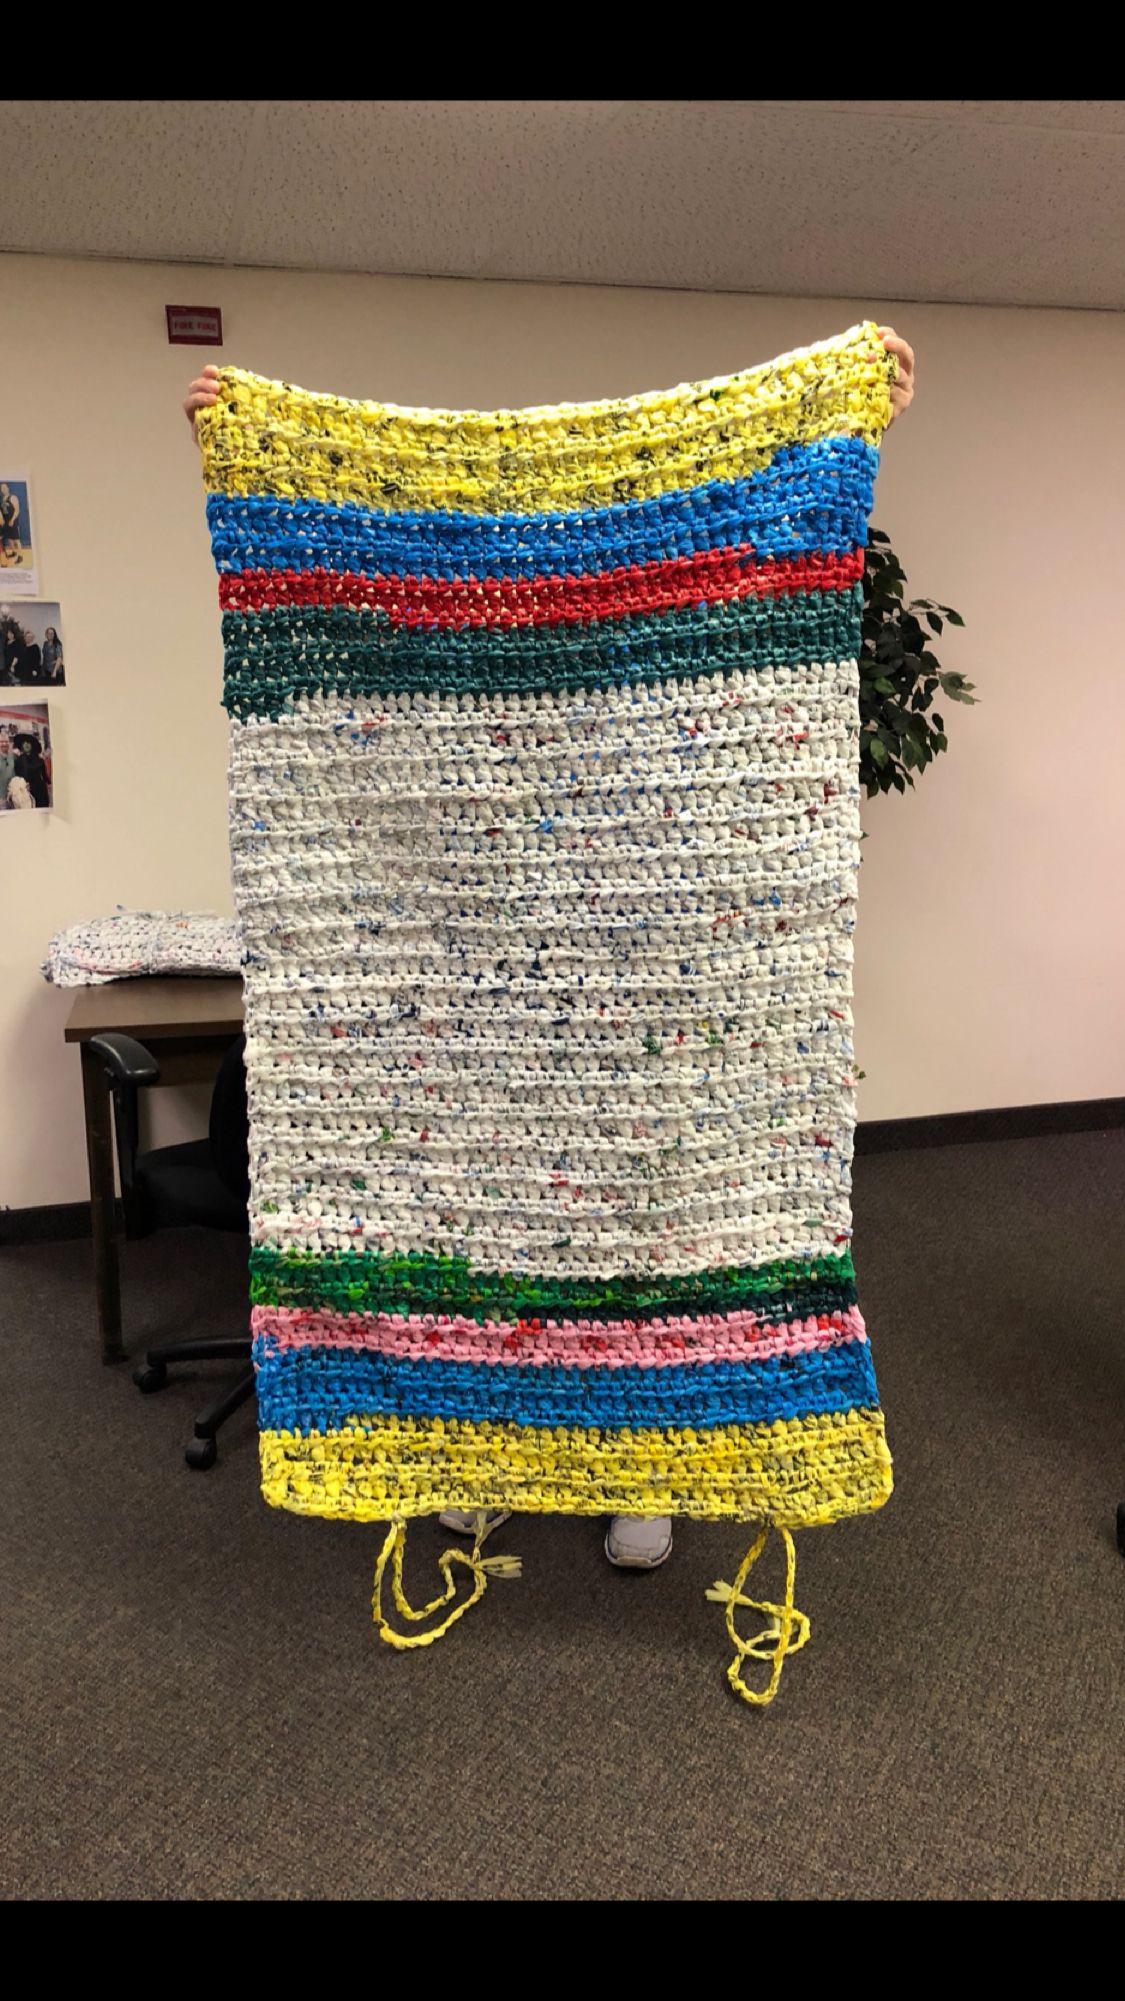 Plastic Bag Sleep Mat Recycled Plastic Bags Throw Blanket Crochet Blanket